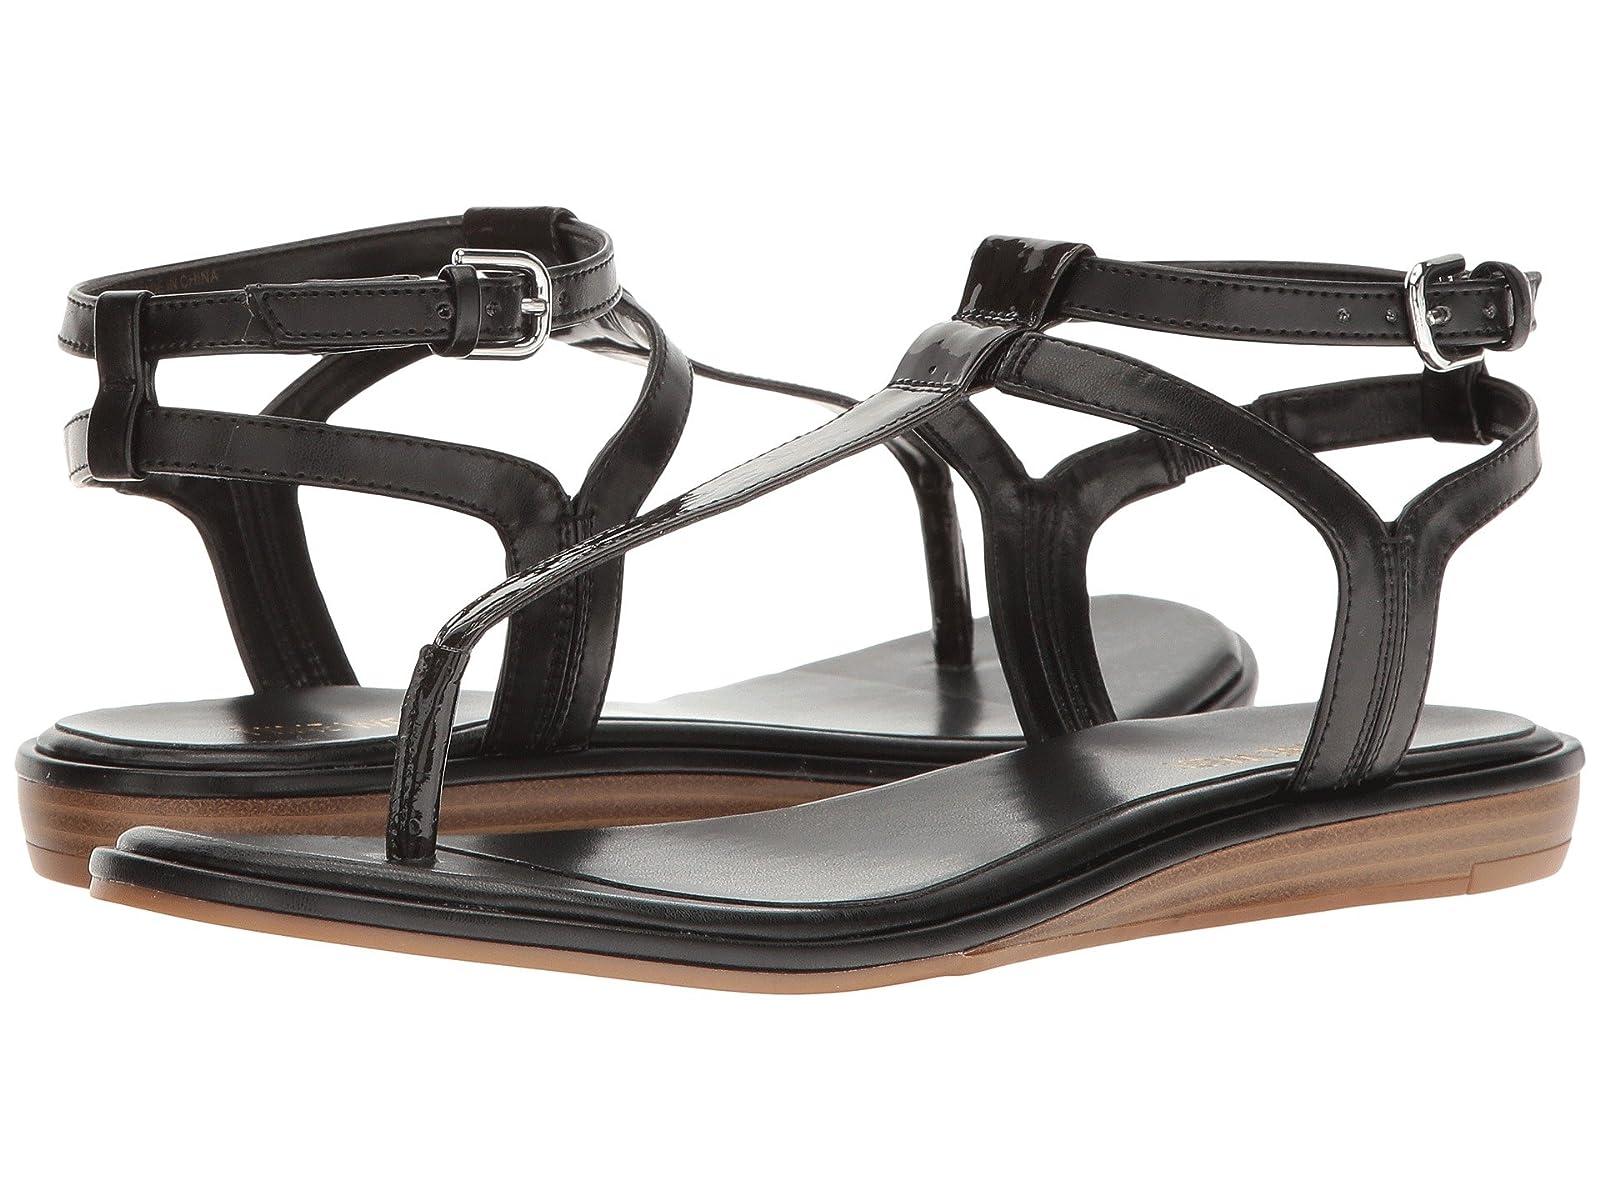 Nine West KealnaCheap and distinctive eye-catching shoes